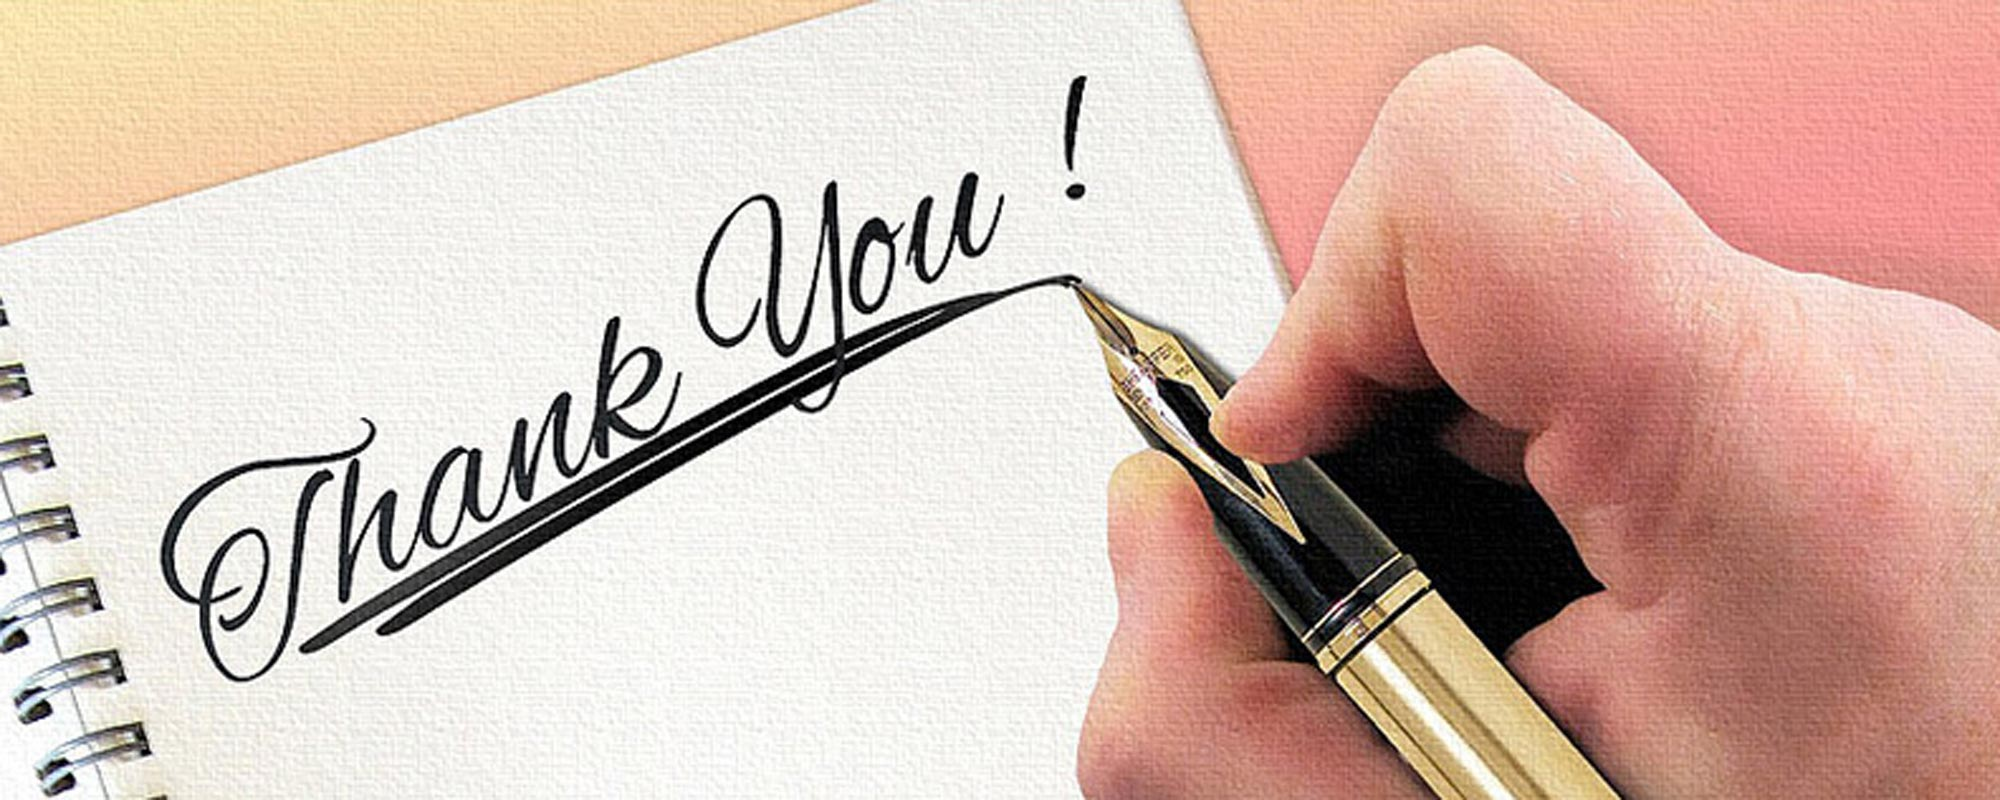 Testimonial Page: Thank You